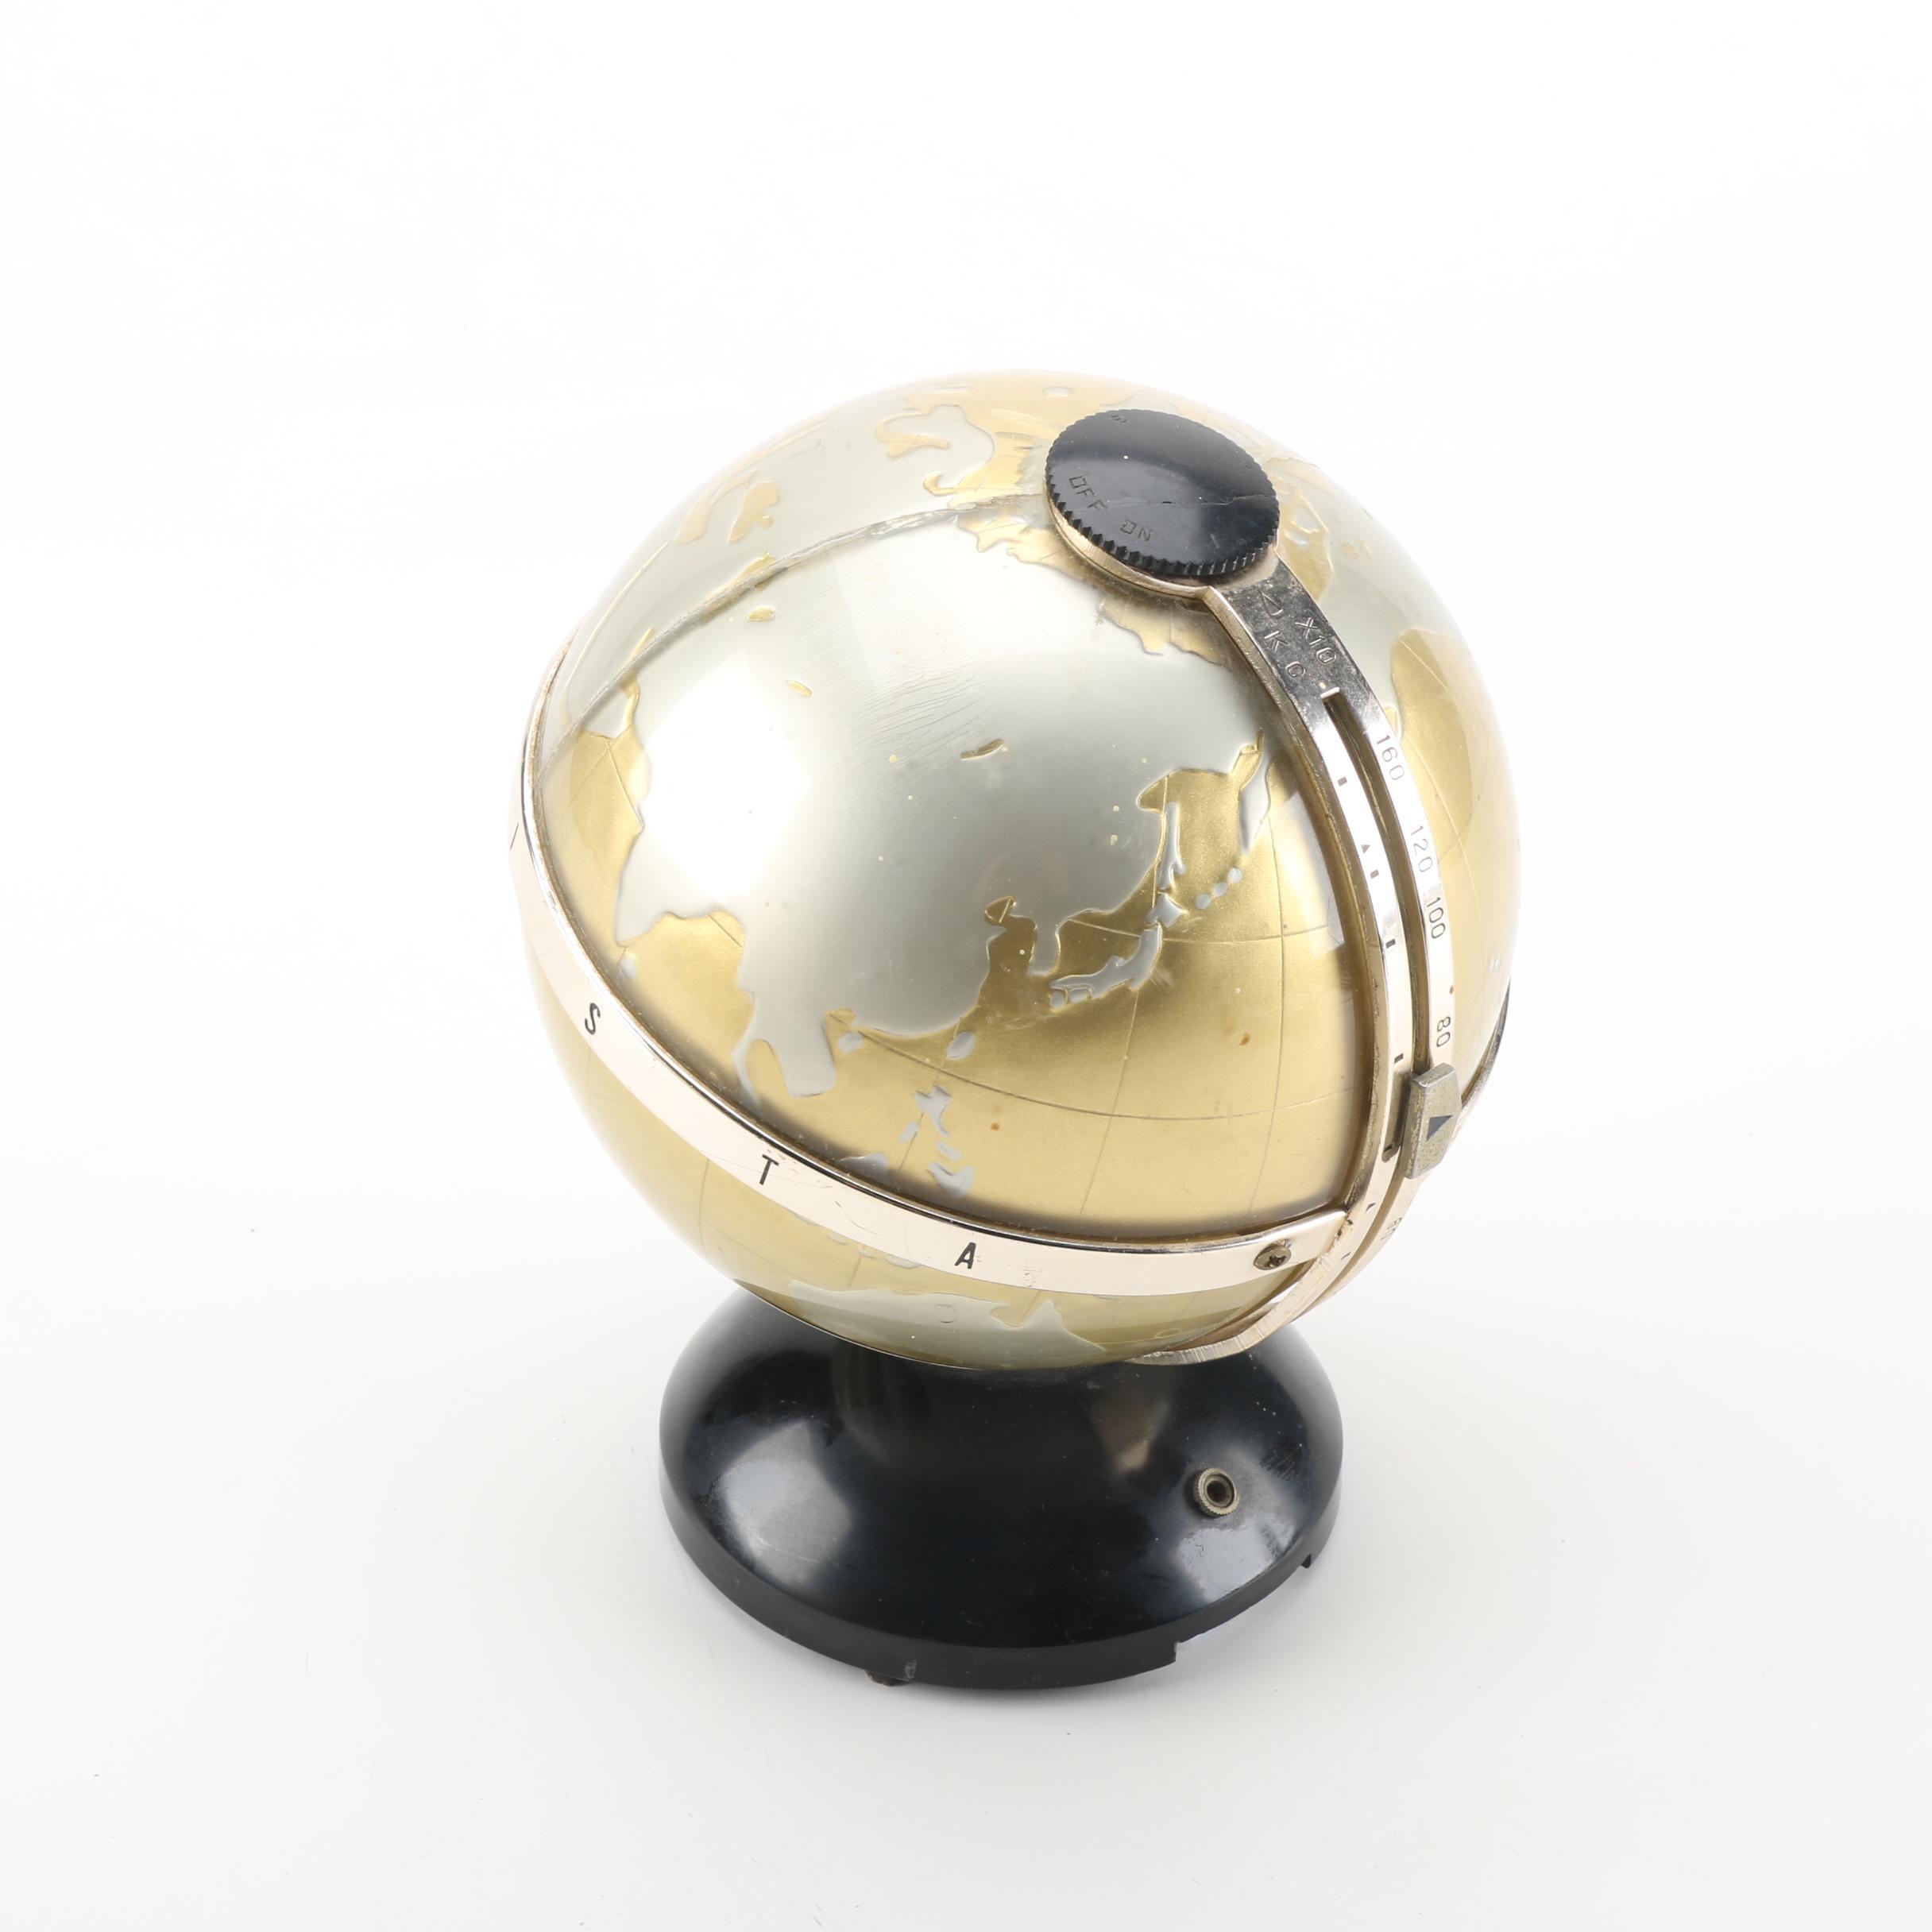 Vintage Vista Globe Radio